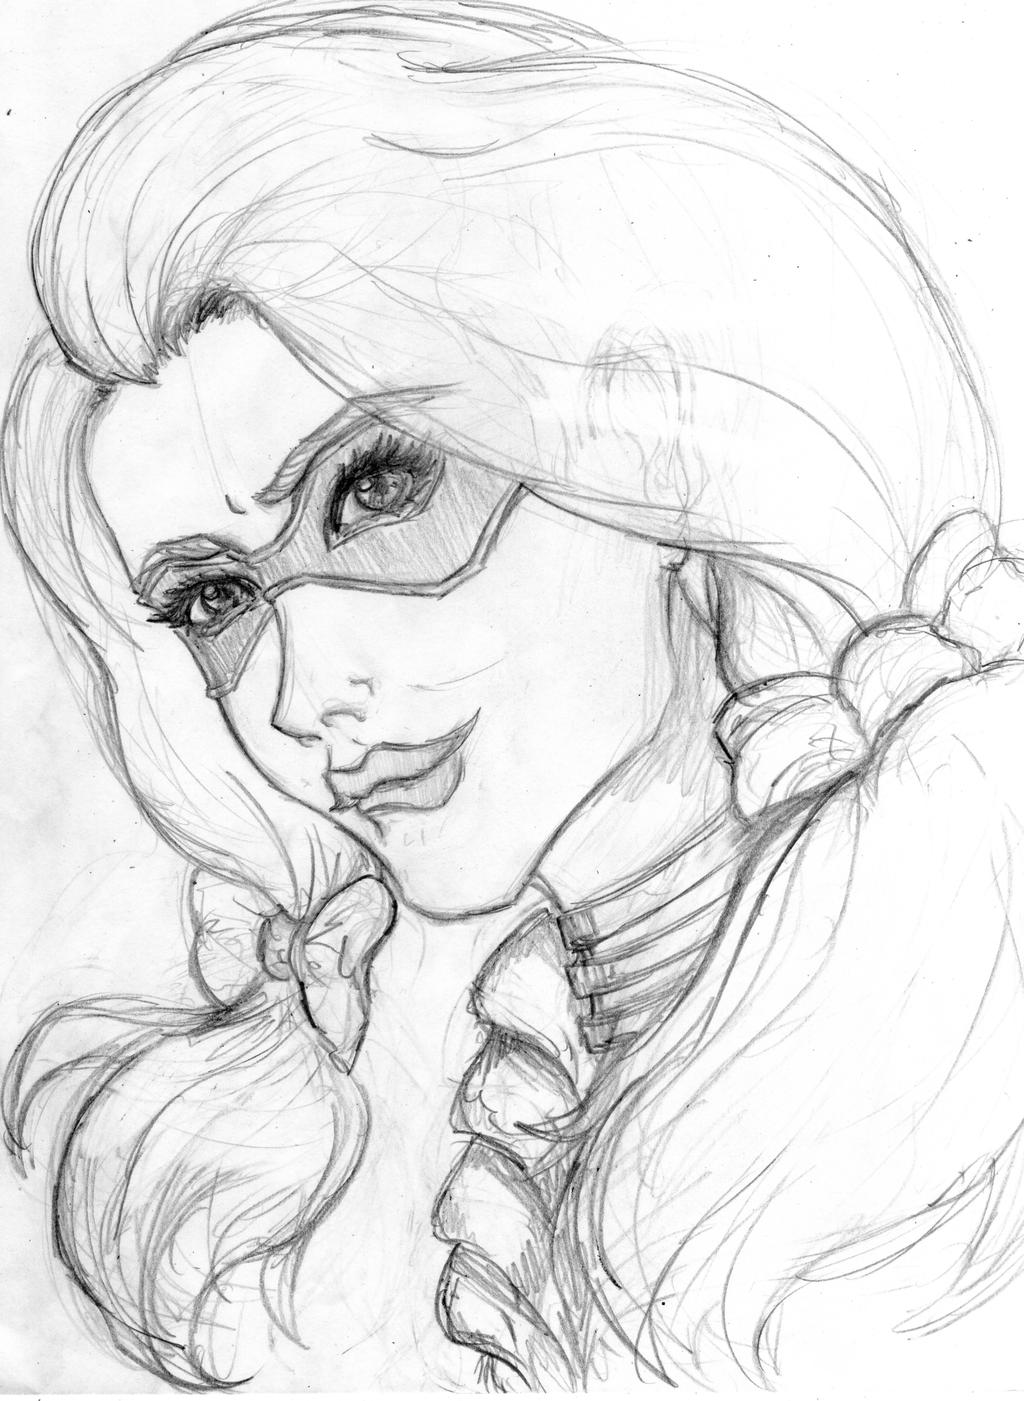 Sketch Harley Quinn By SerenityMoonCosplay On DeviantArt